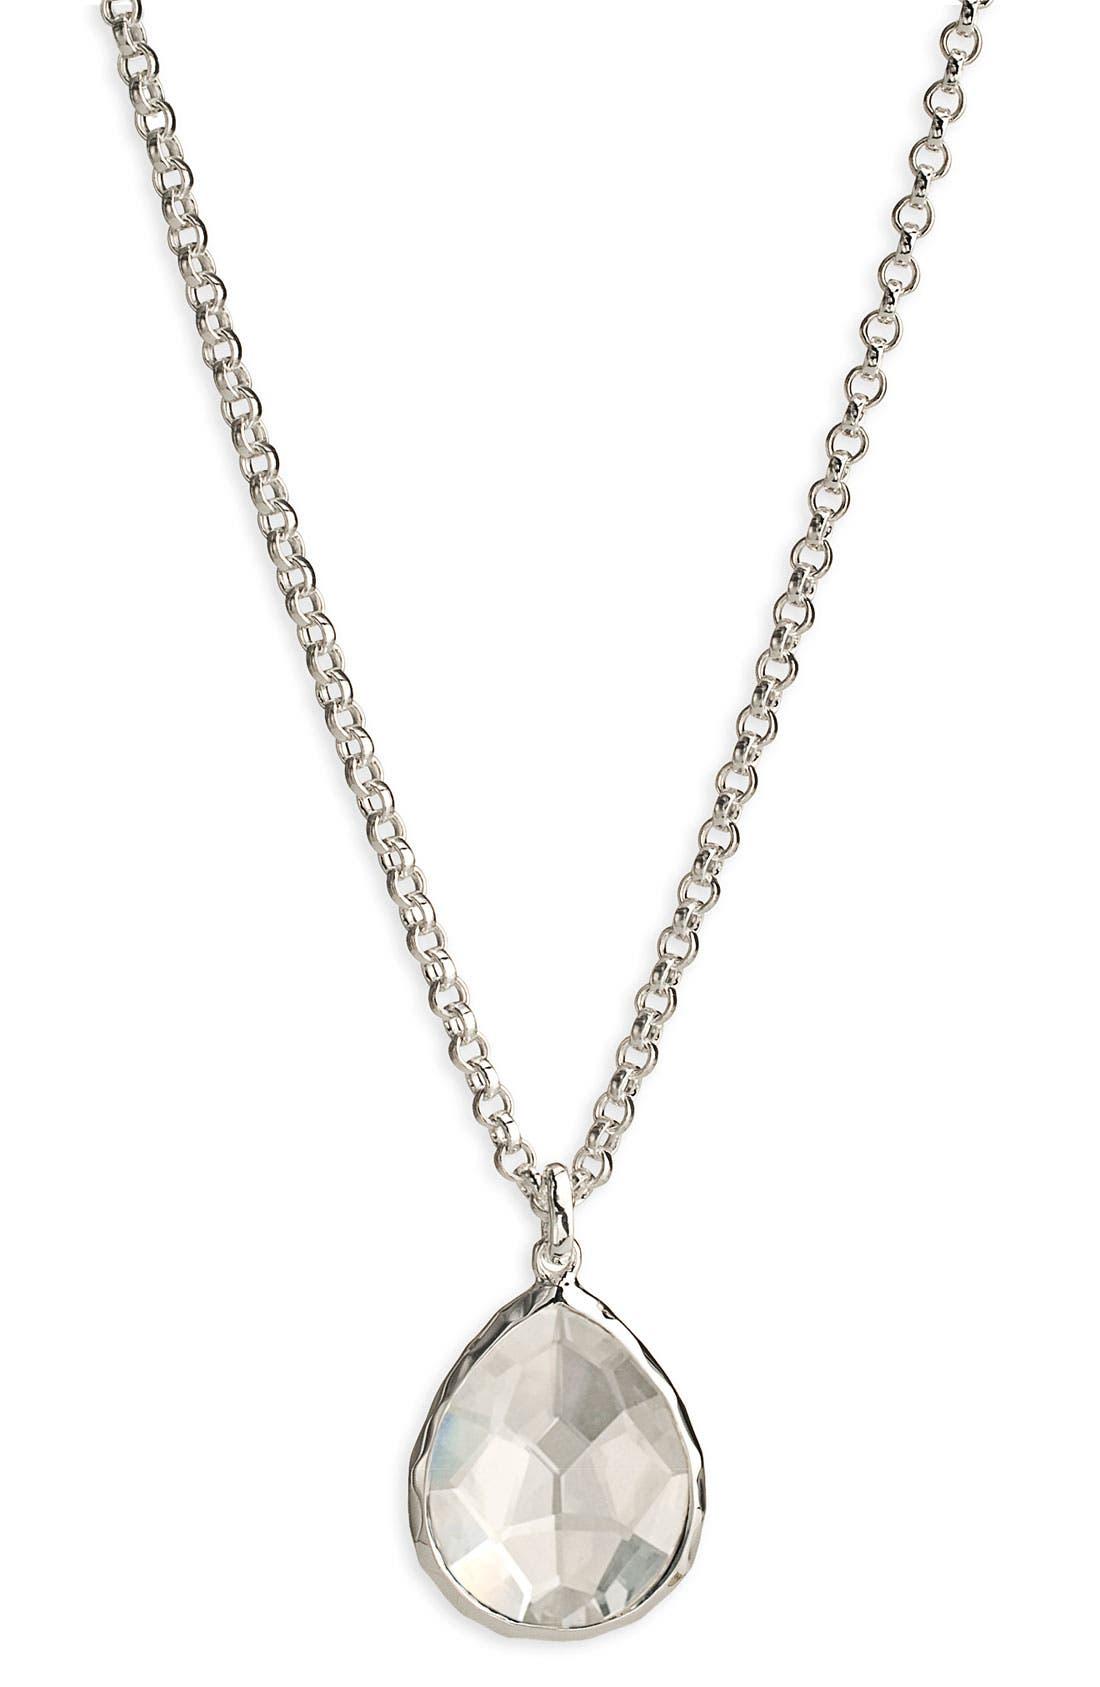 Main Image - Ippolita 'Wonderland' Mini Teardrop Pendant Necklace (Online Only)